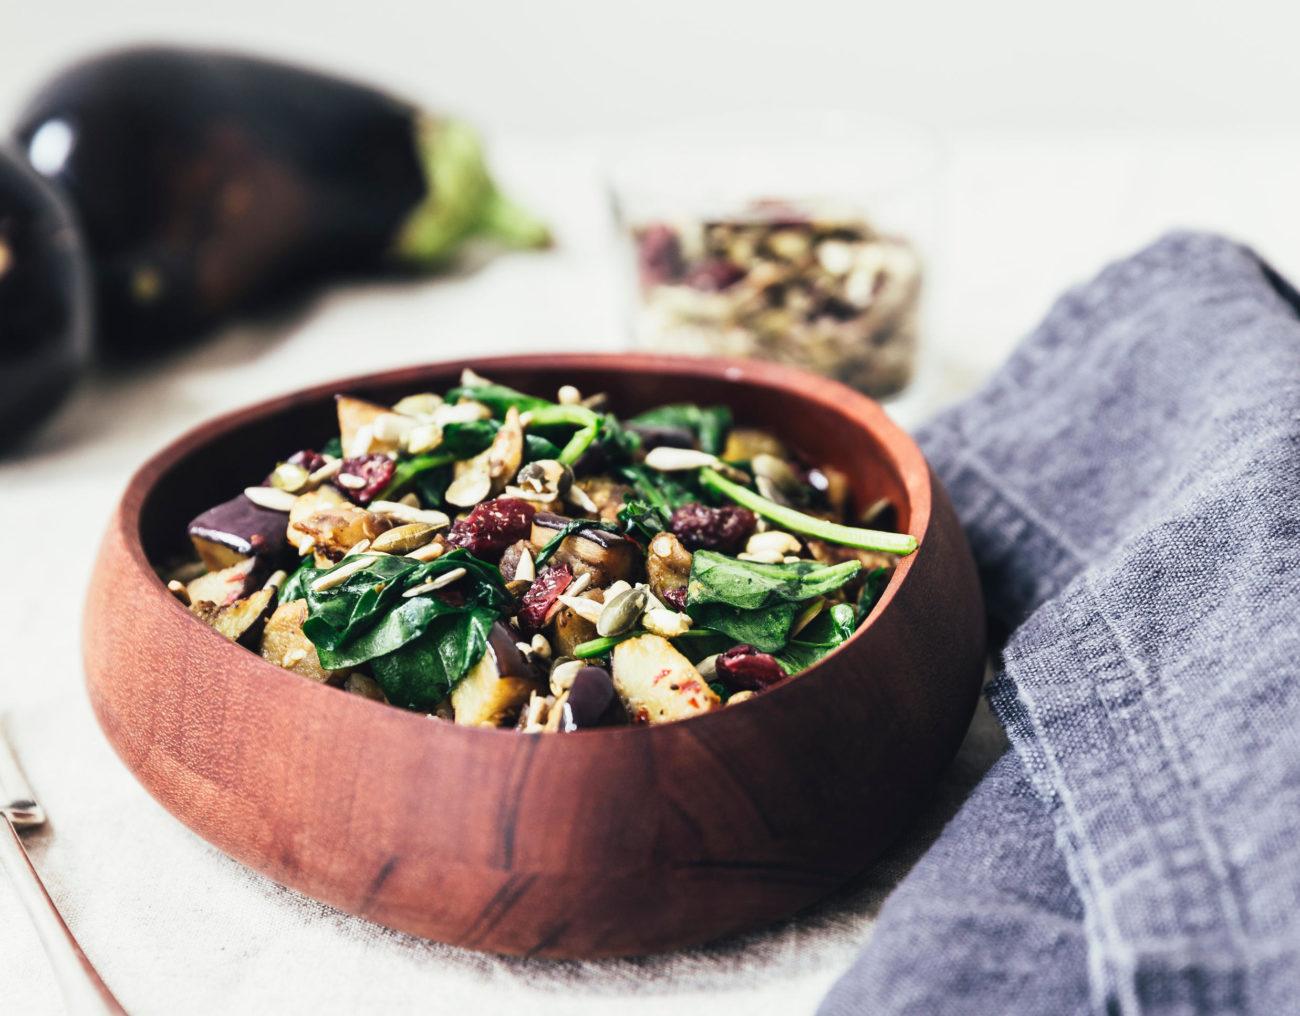 Speltsalat med stegte auberginer, kerner og tranebær samt spinat